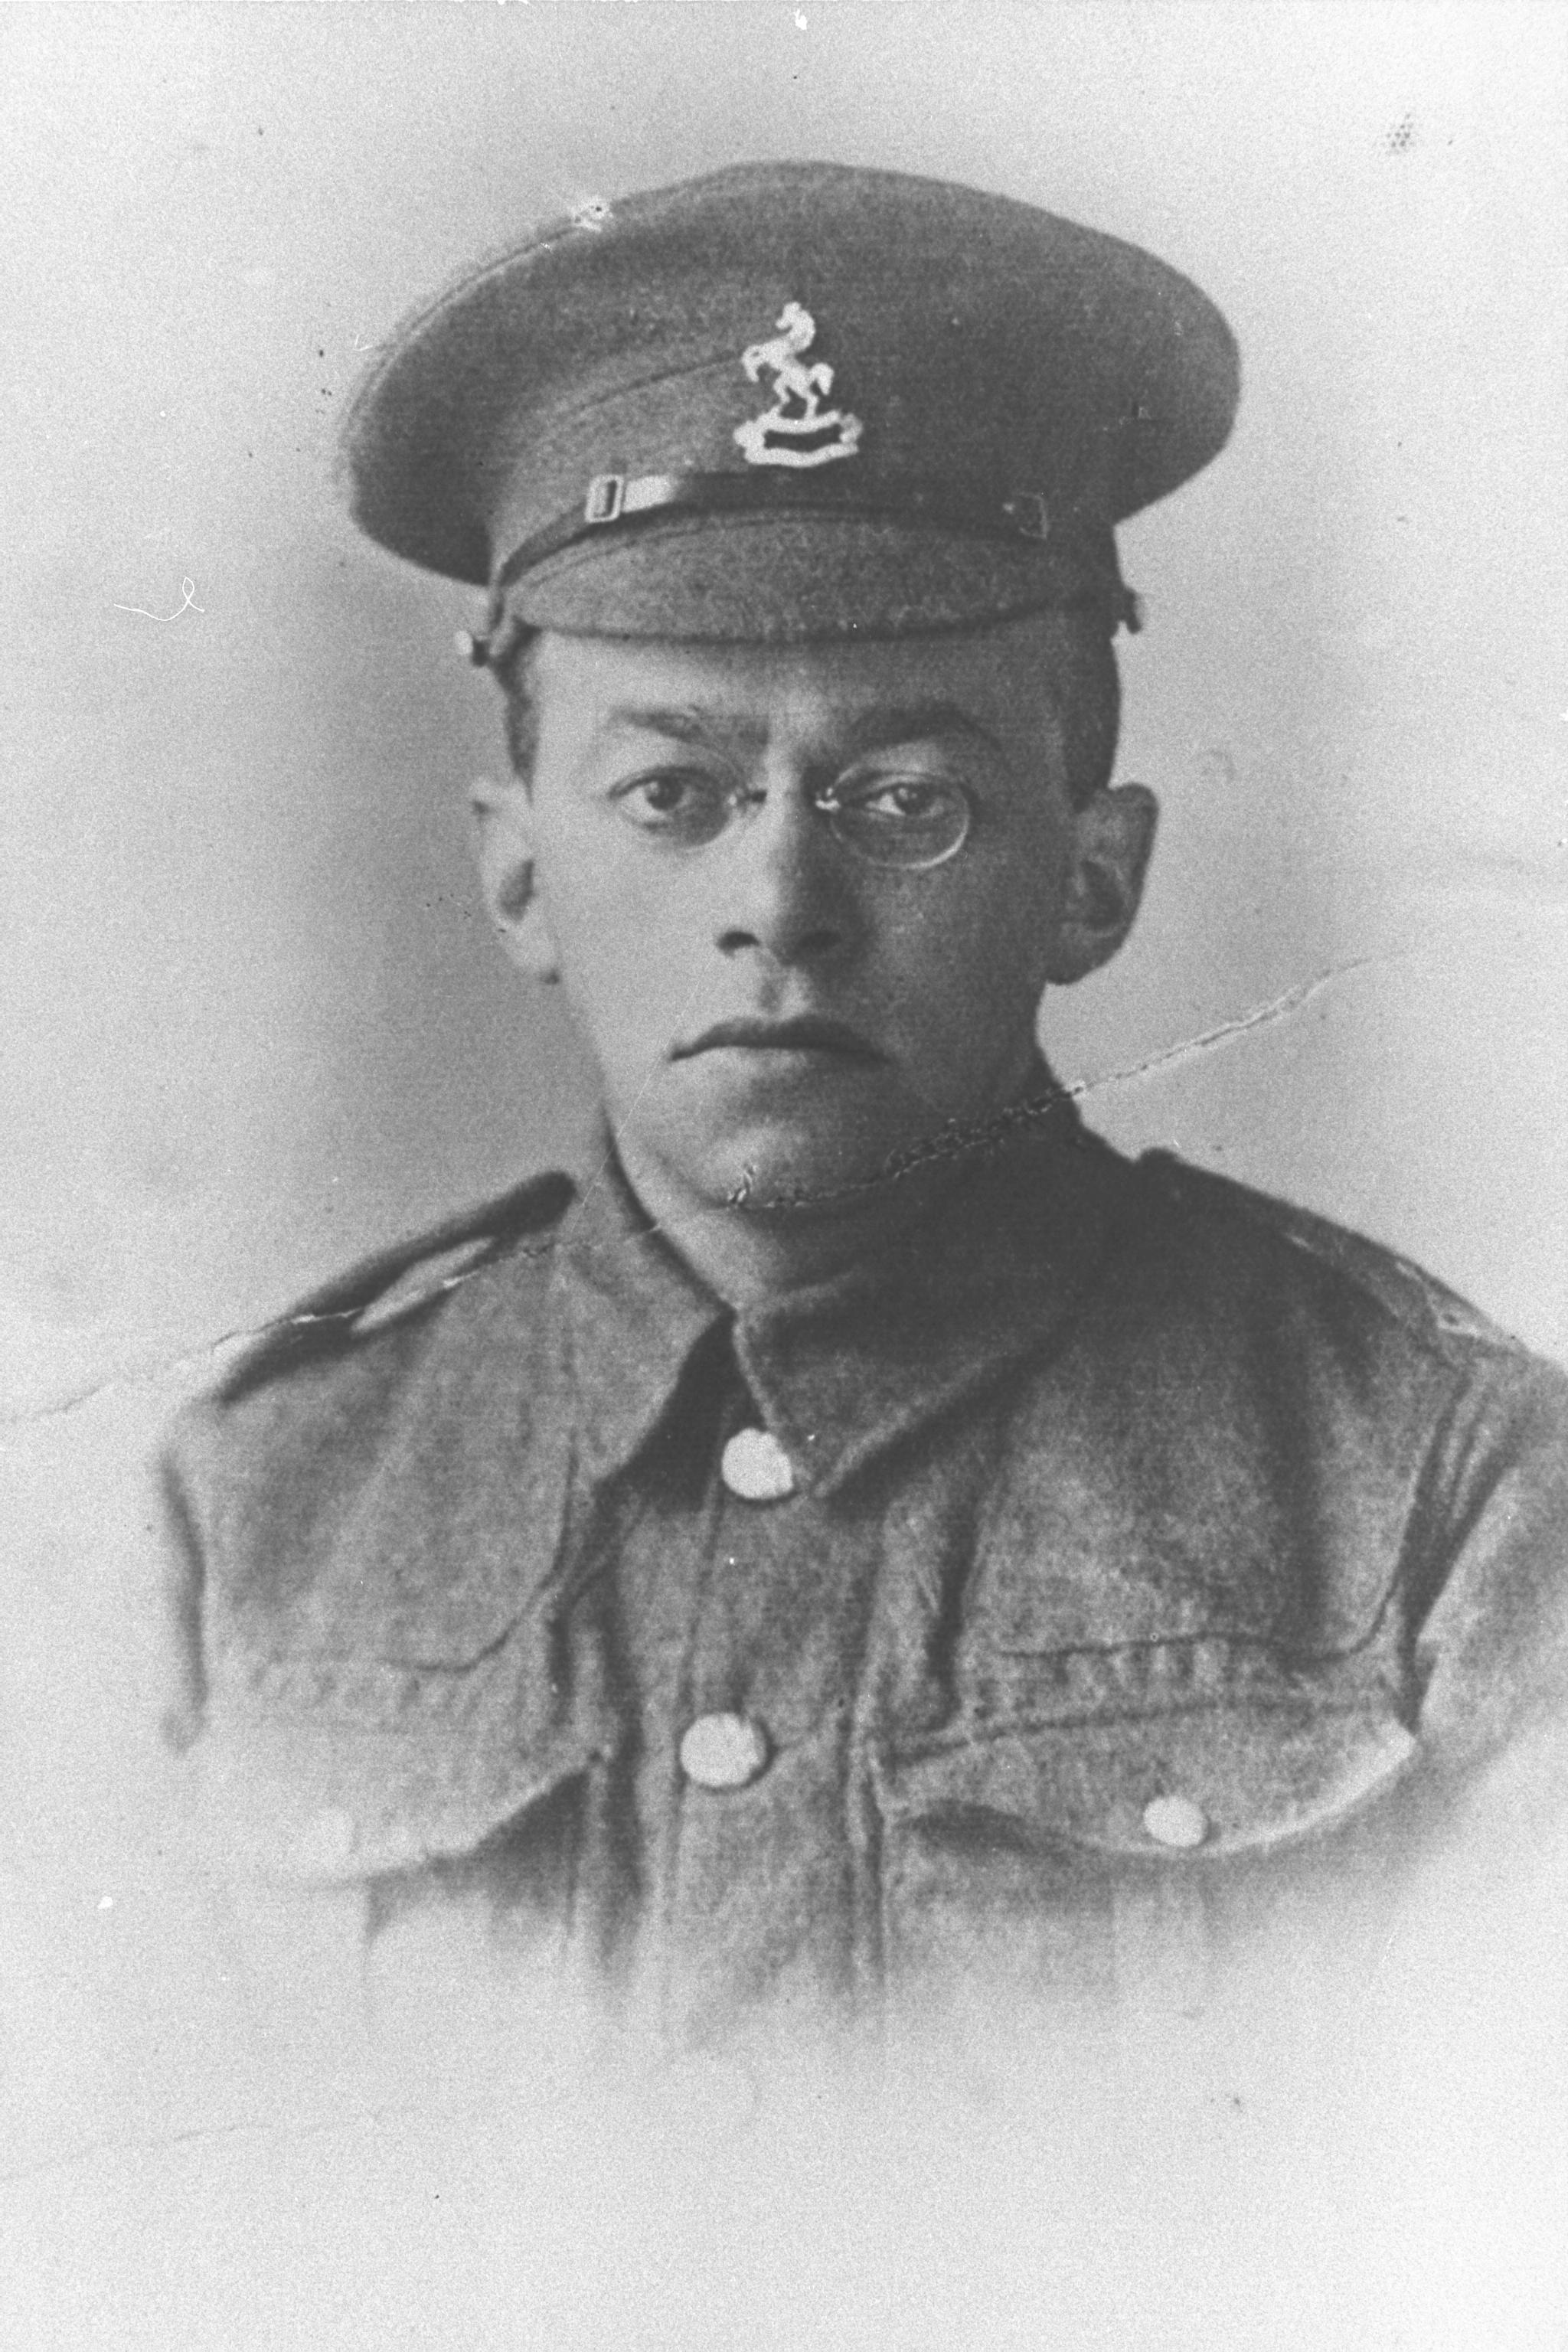 File:ZEEV JABOTINSKY IN ARMY UNIFORM DURING WORLD WAR 1. פורטרט, זאב ז'בוטינסקי במדים צבאיים, בזמן מלחמת העולם הראשונה..jpg - Wikimedia Commons